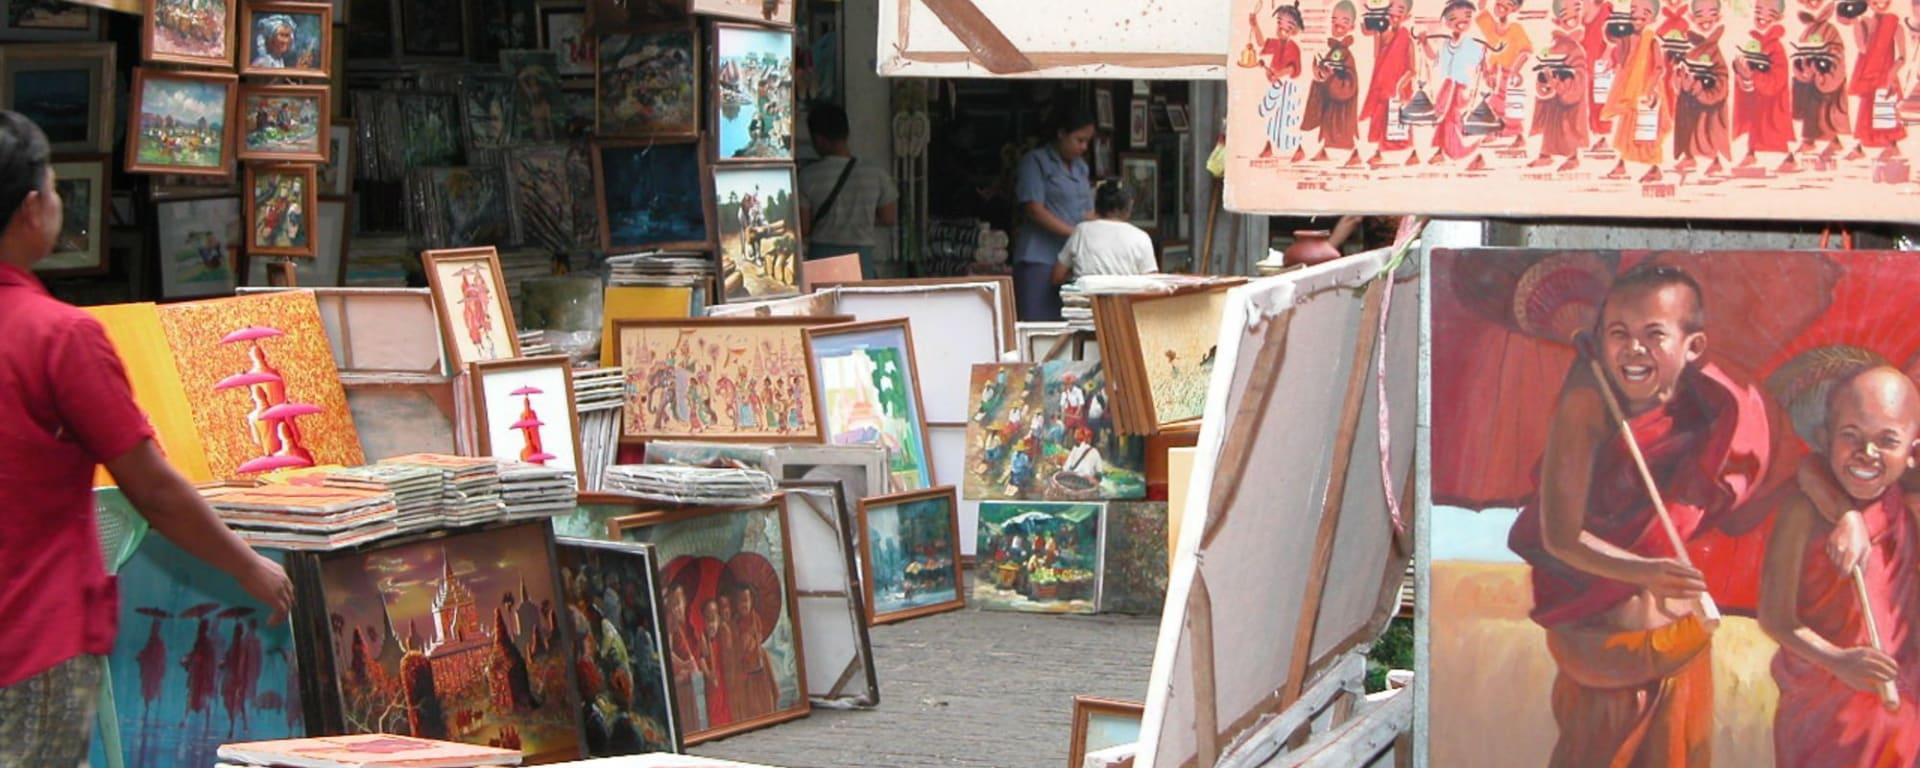 Tour de ville de Yangon: Yangon Bogyoke Market 003